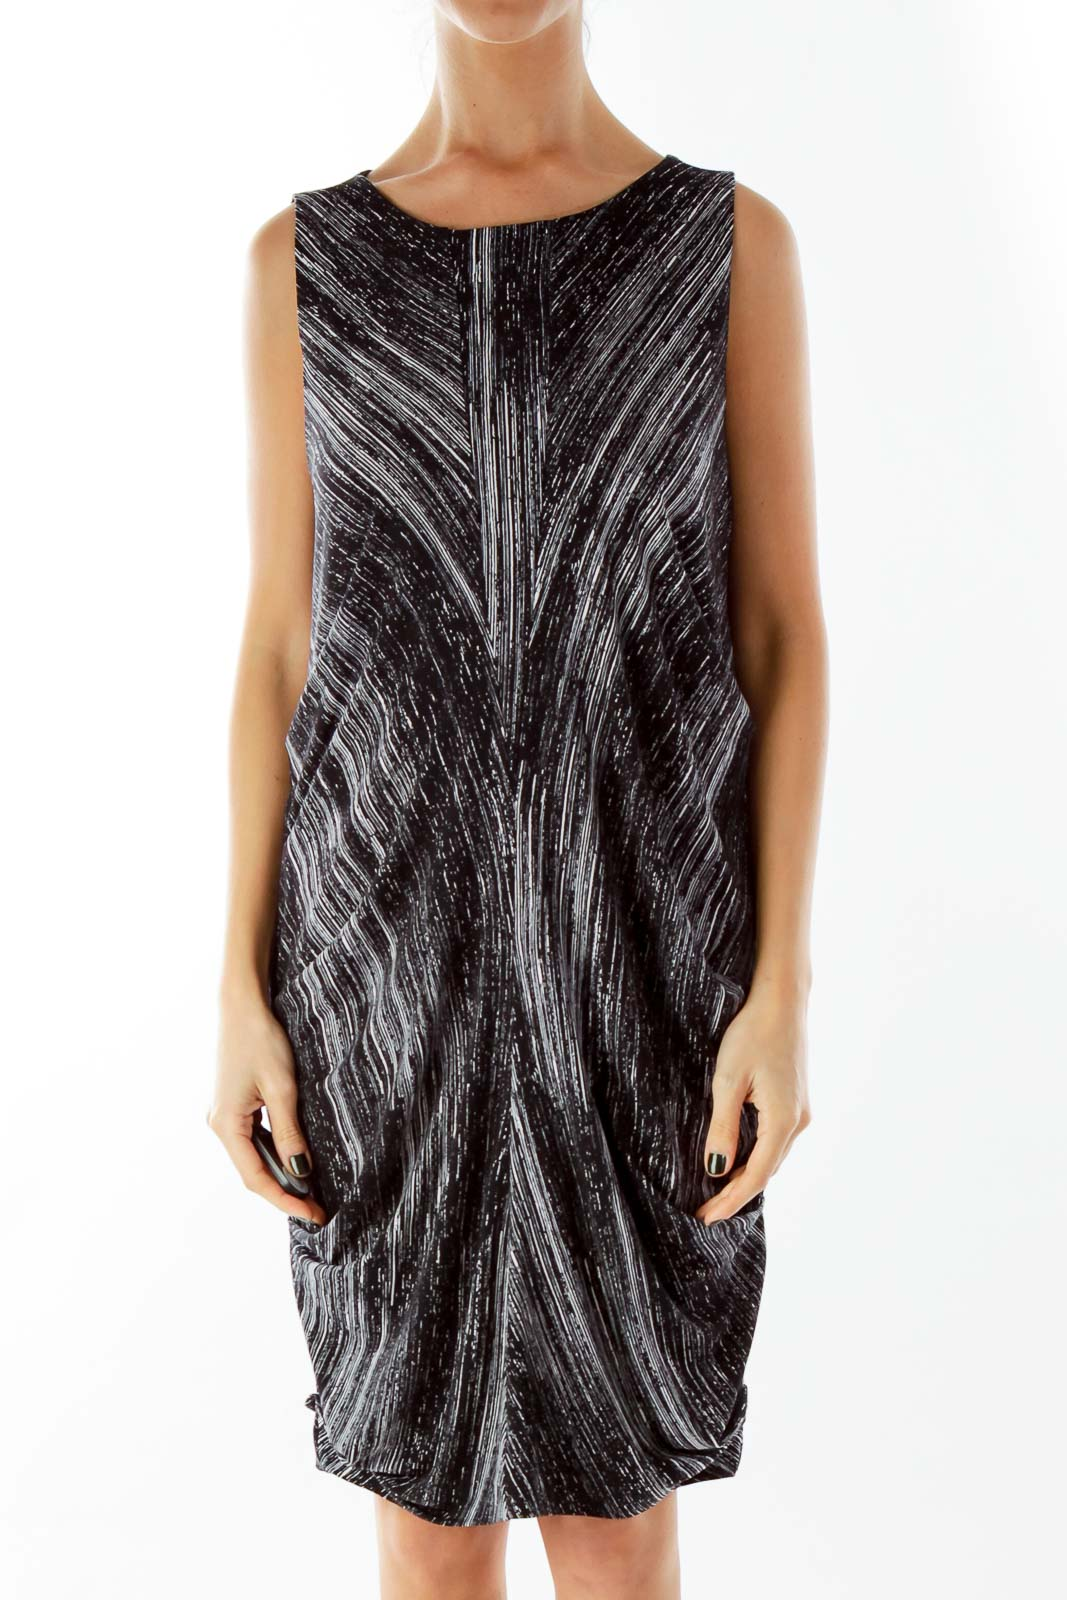 Black White Print Sleeveless Day Dress Front